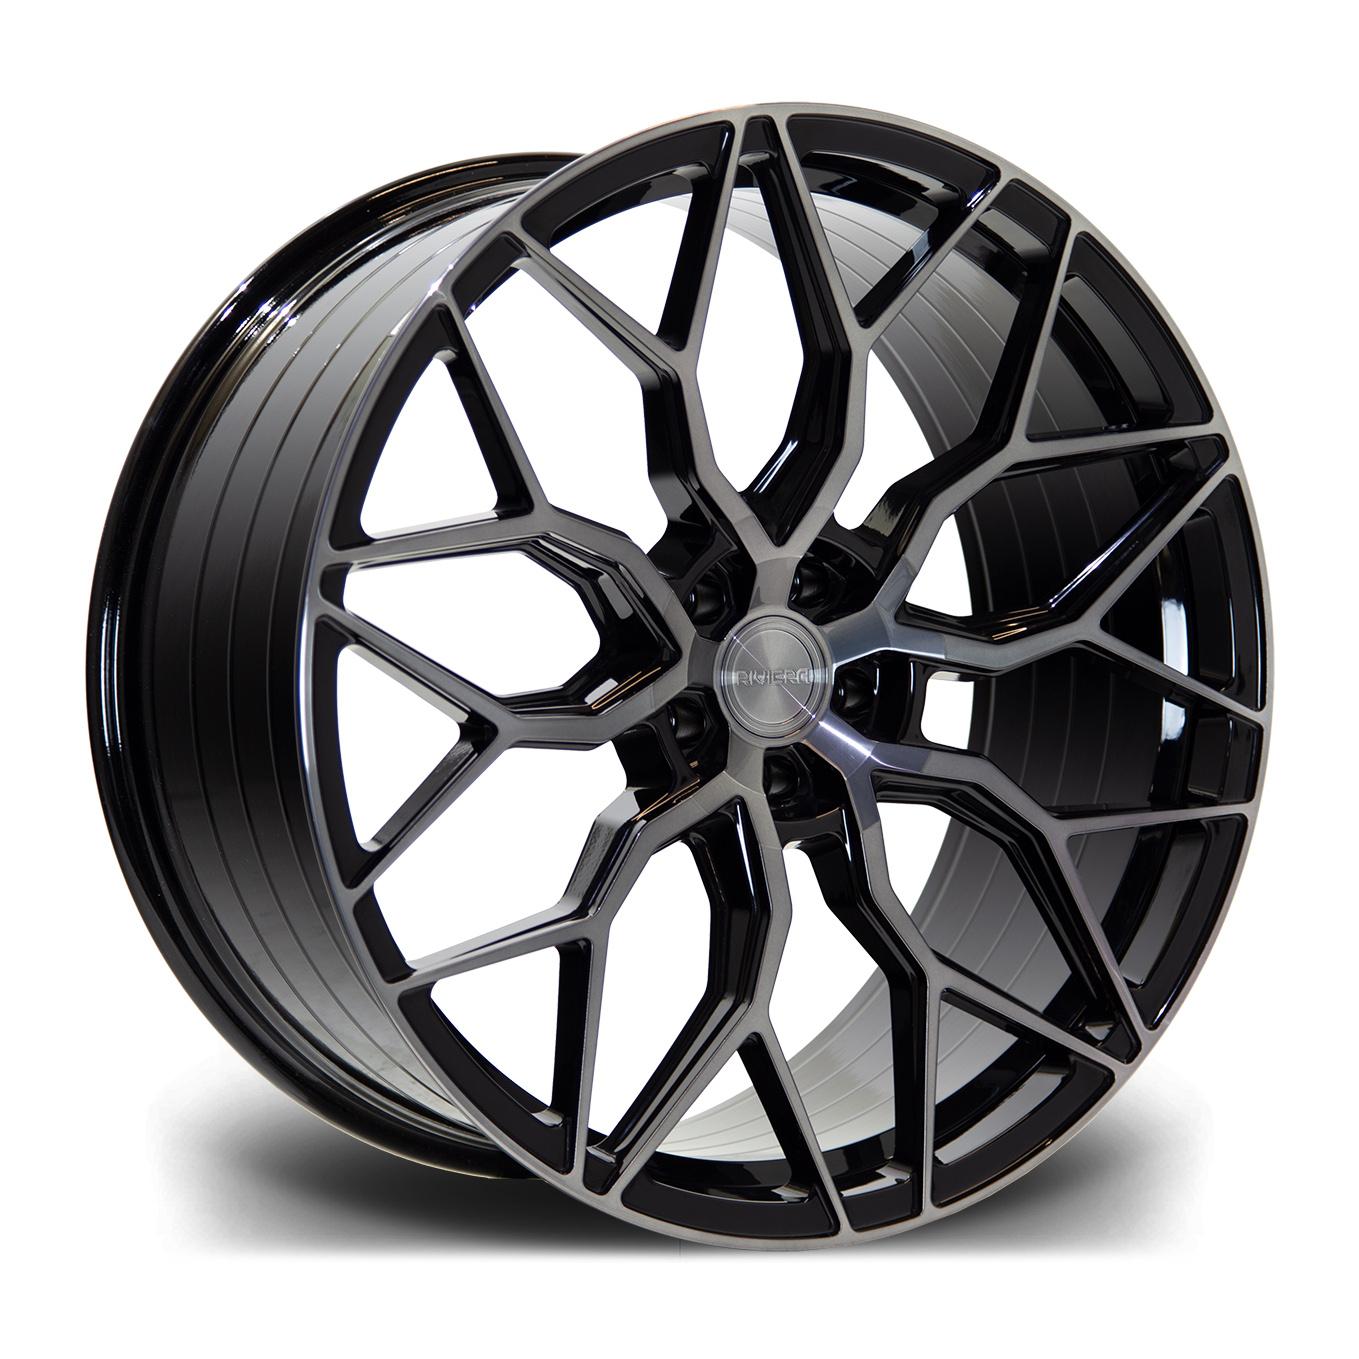 Cerchi in lega  Riviera  RF108  23''  Width 10.5   5X120  ET 35  CB 72.6    Black Polished Dtint